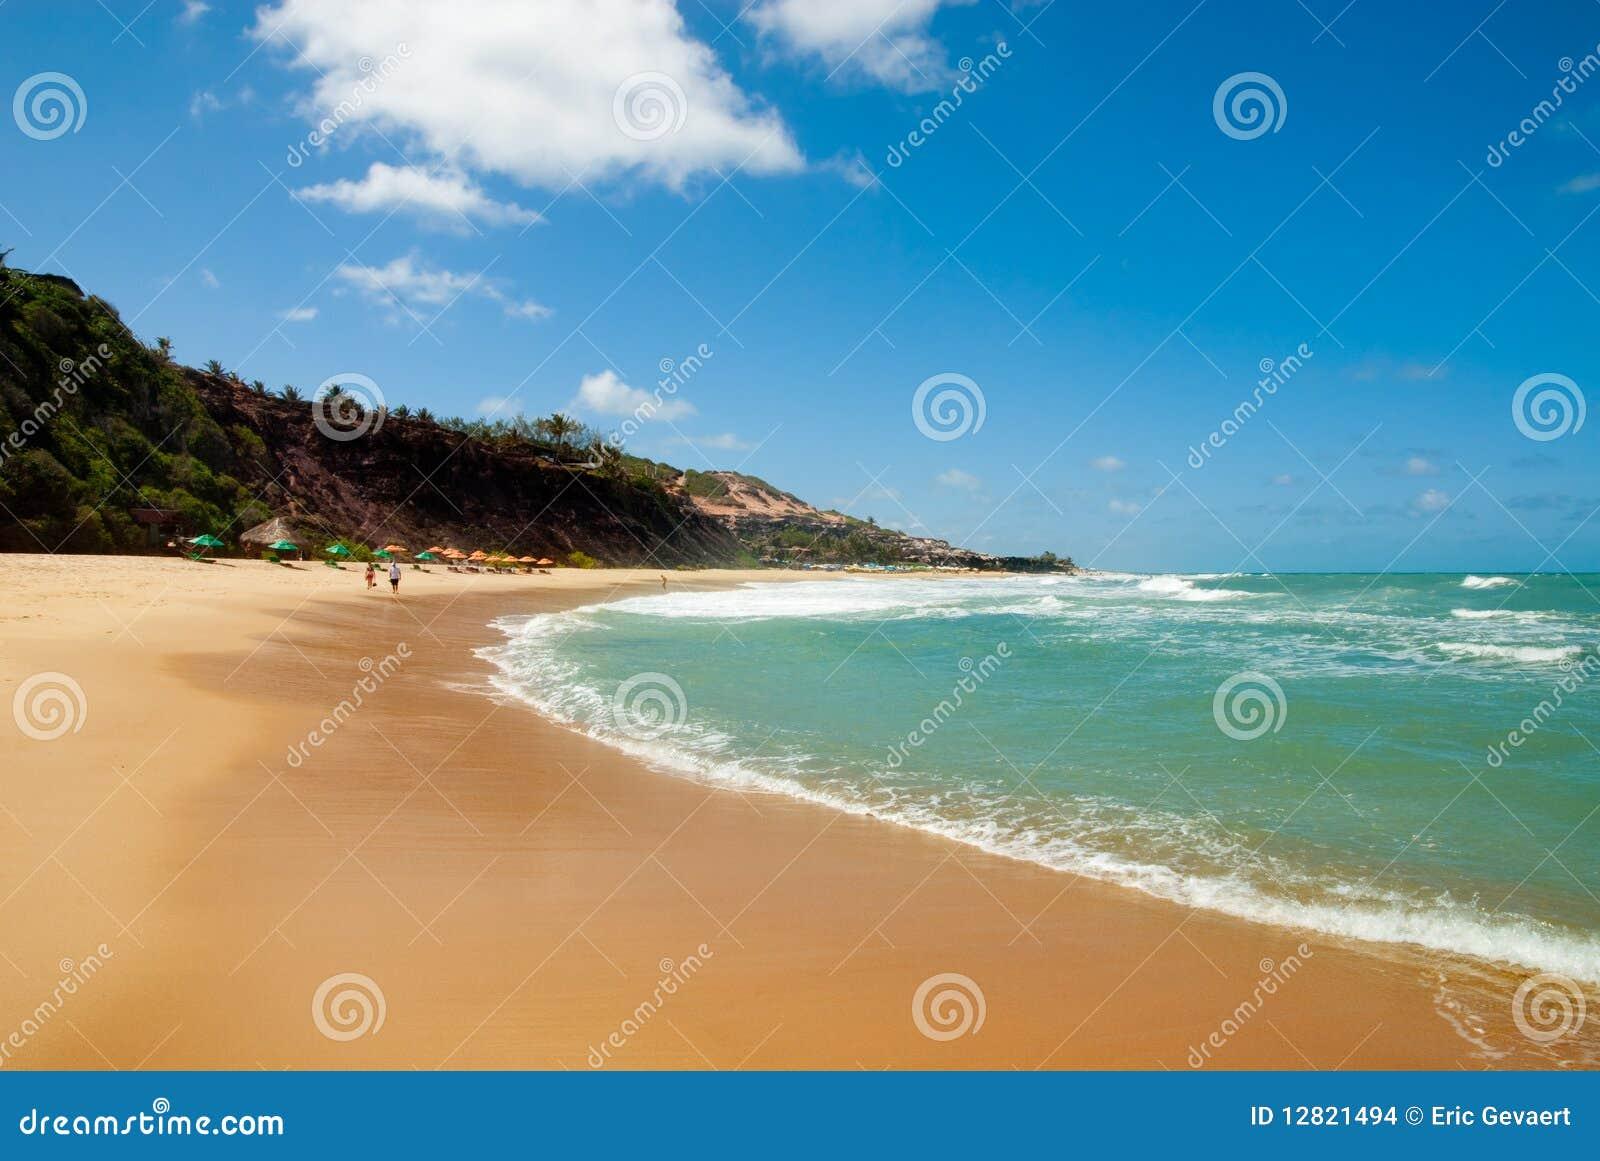 Beautiful beach with palm trees at Praia do Amor